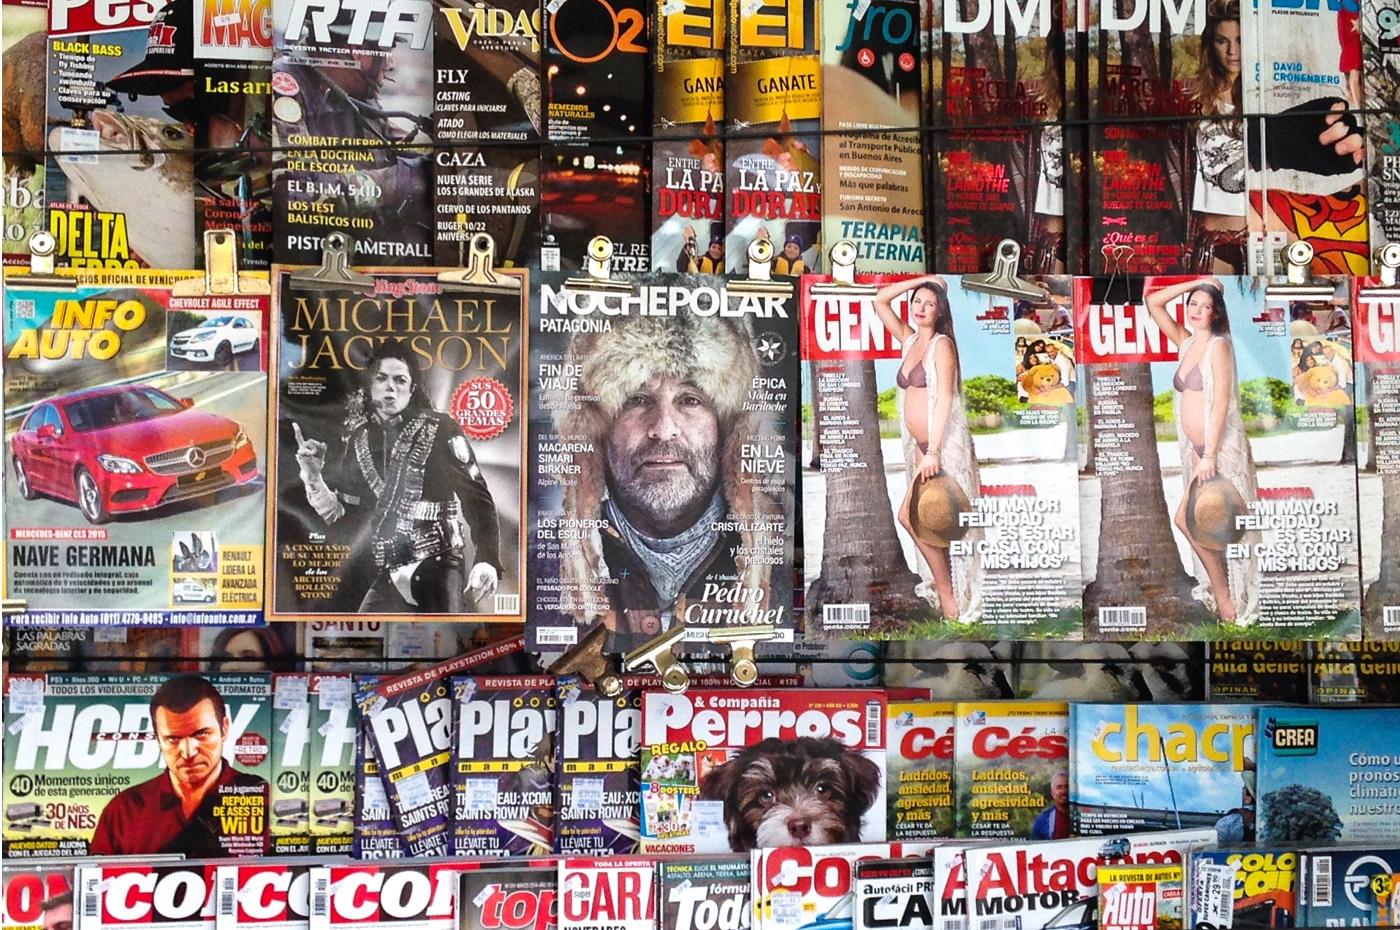 nochepolar editorialpolar patagonia magazine culture Entertainment art identity Stories